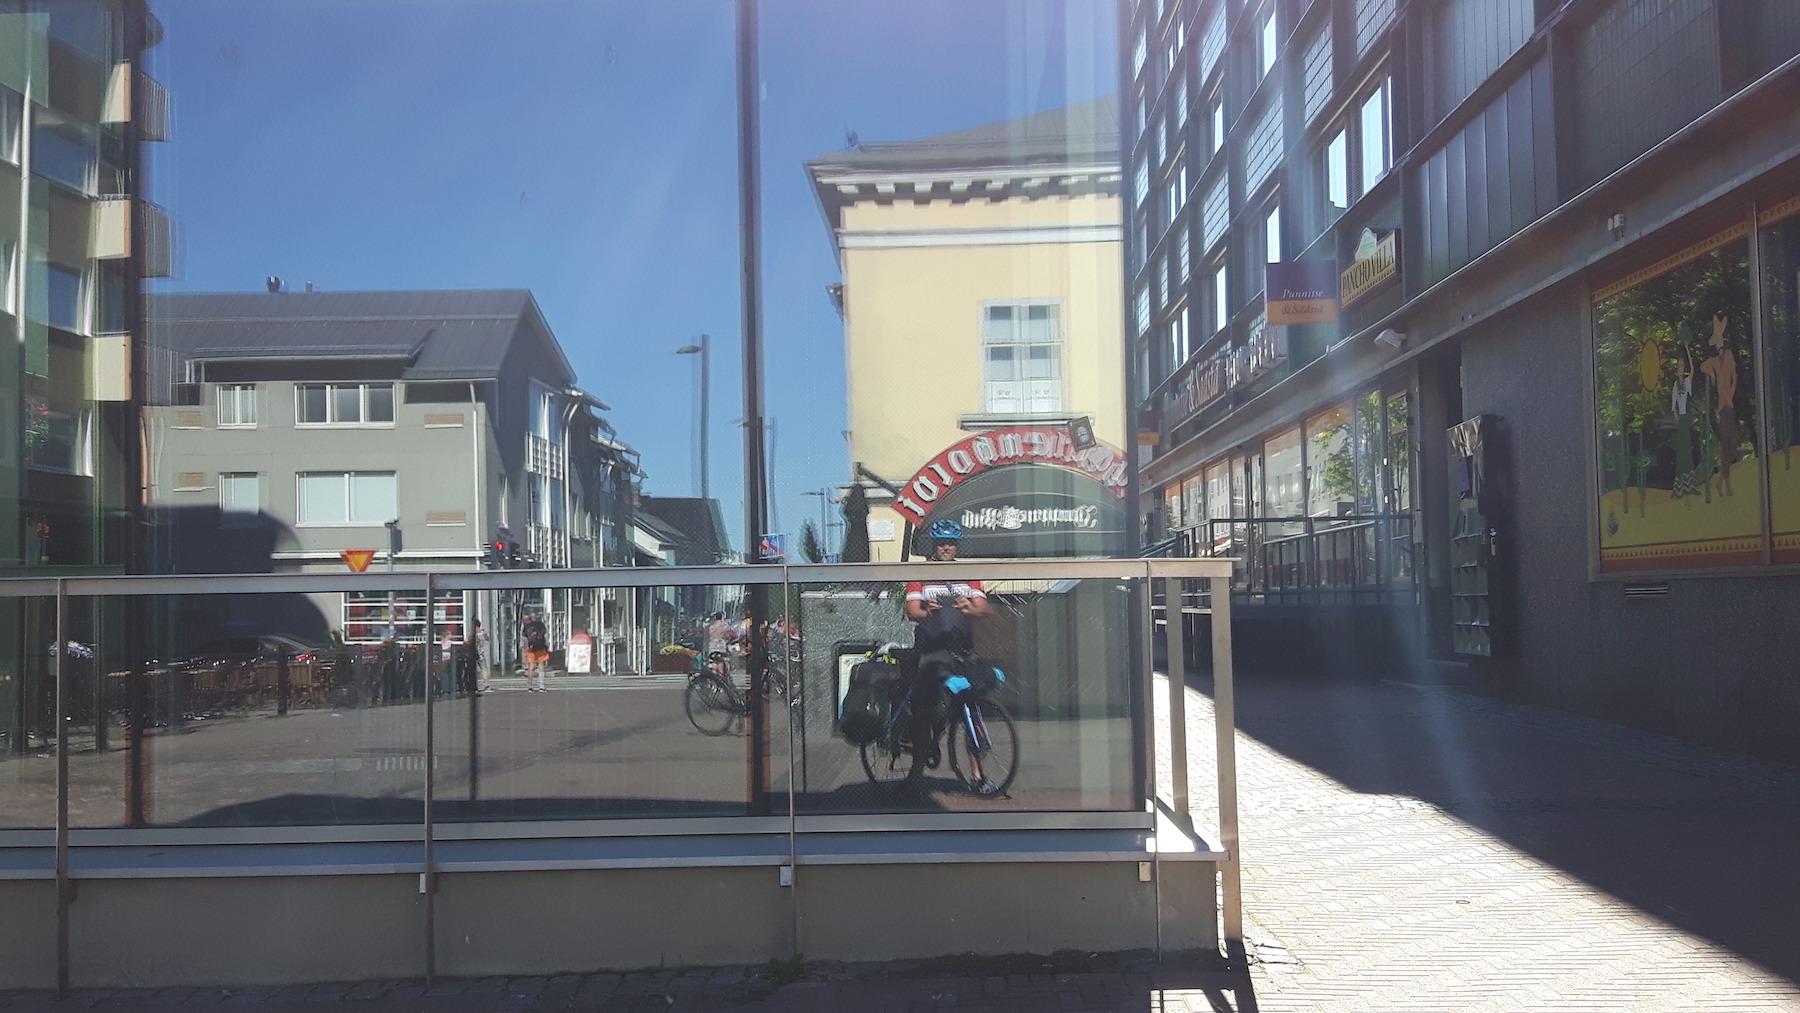 Reflection in a building window Oulu Finland